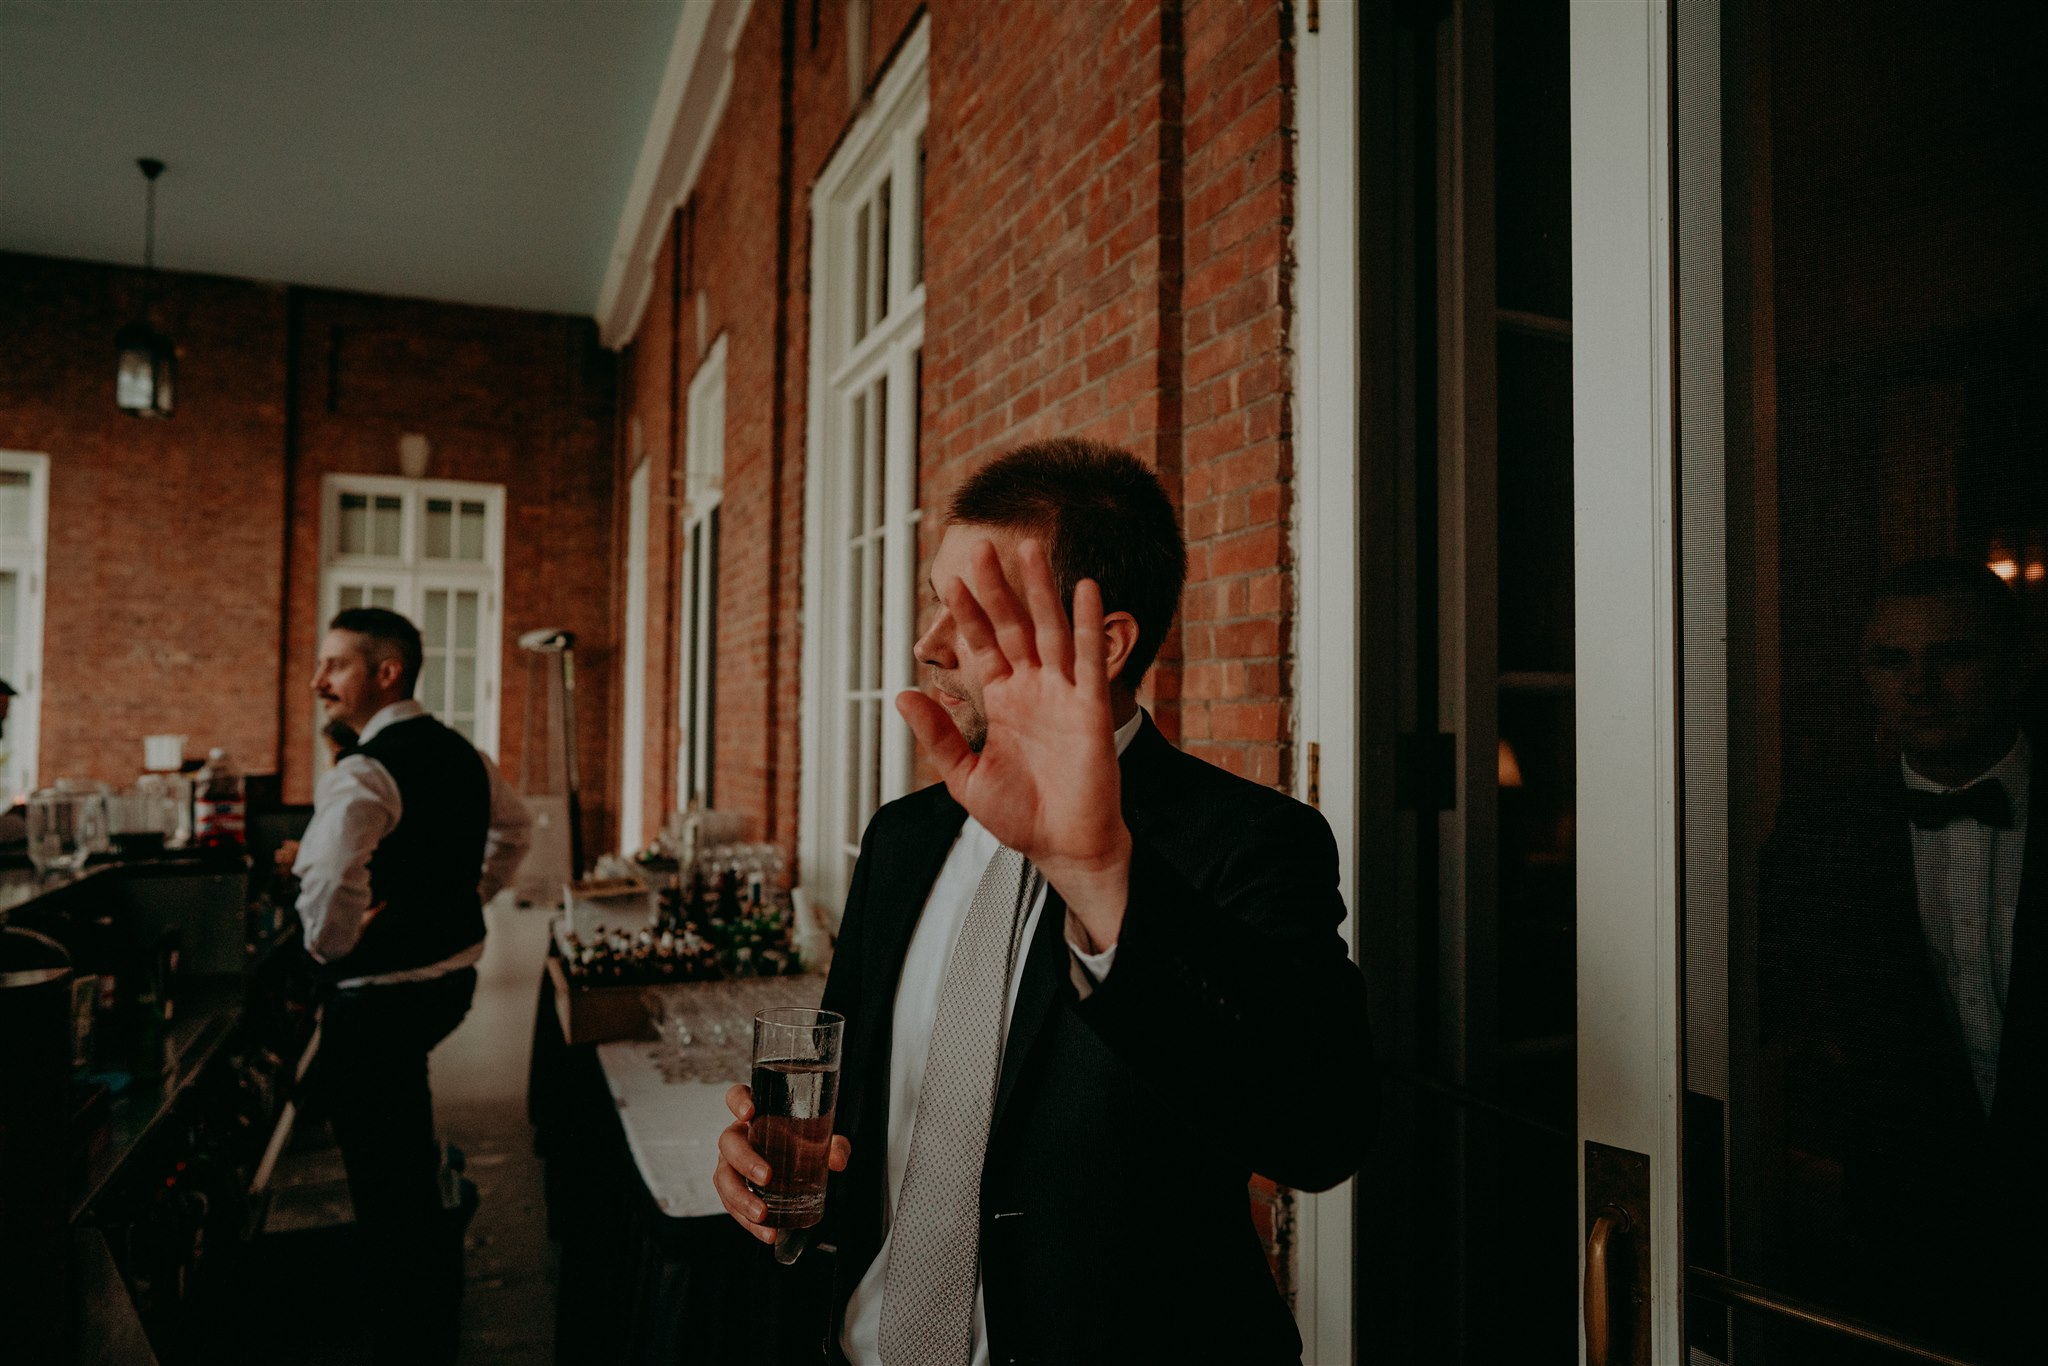 Chellise_Michael_Photography_Hudson_Valley_Wedding_Photographer_Otesaga_Hotel-6068.jpg